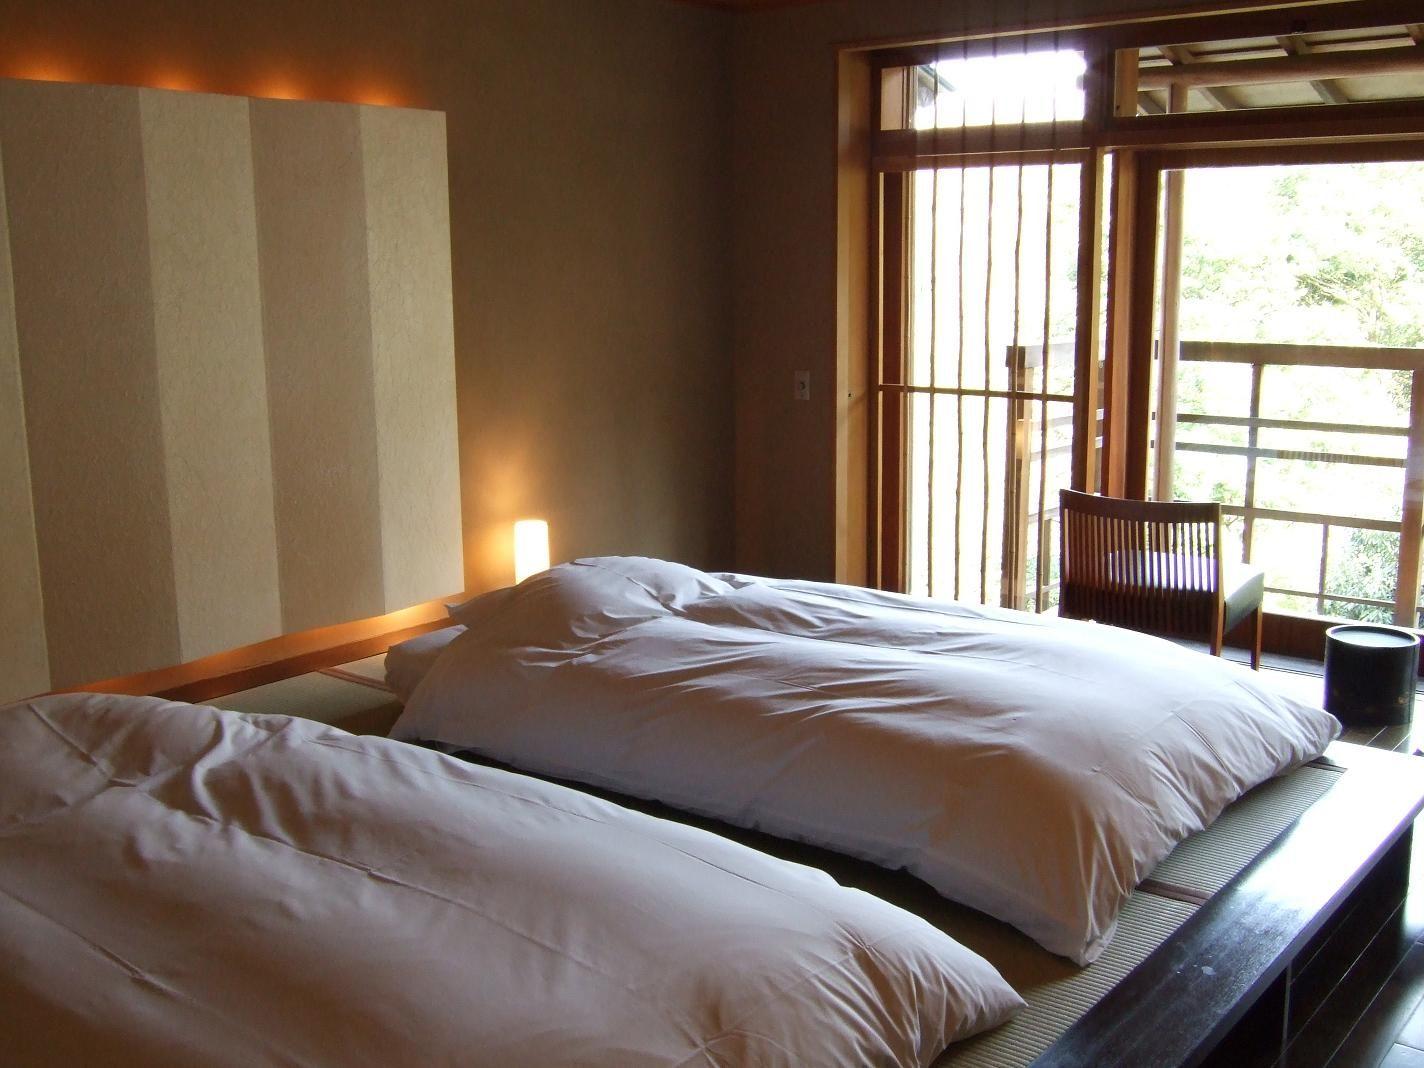 Ryokan Japanese Style Hotel Futon At Gorakadan In Hakone